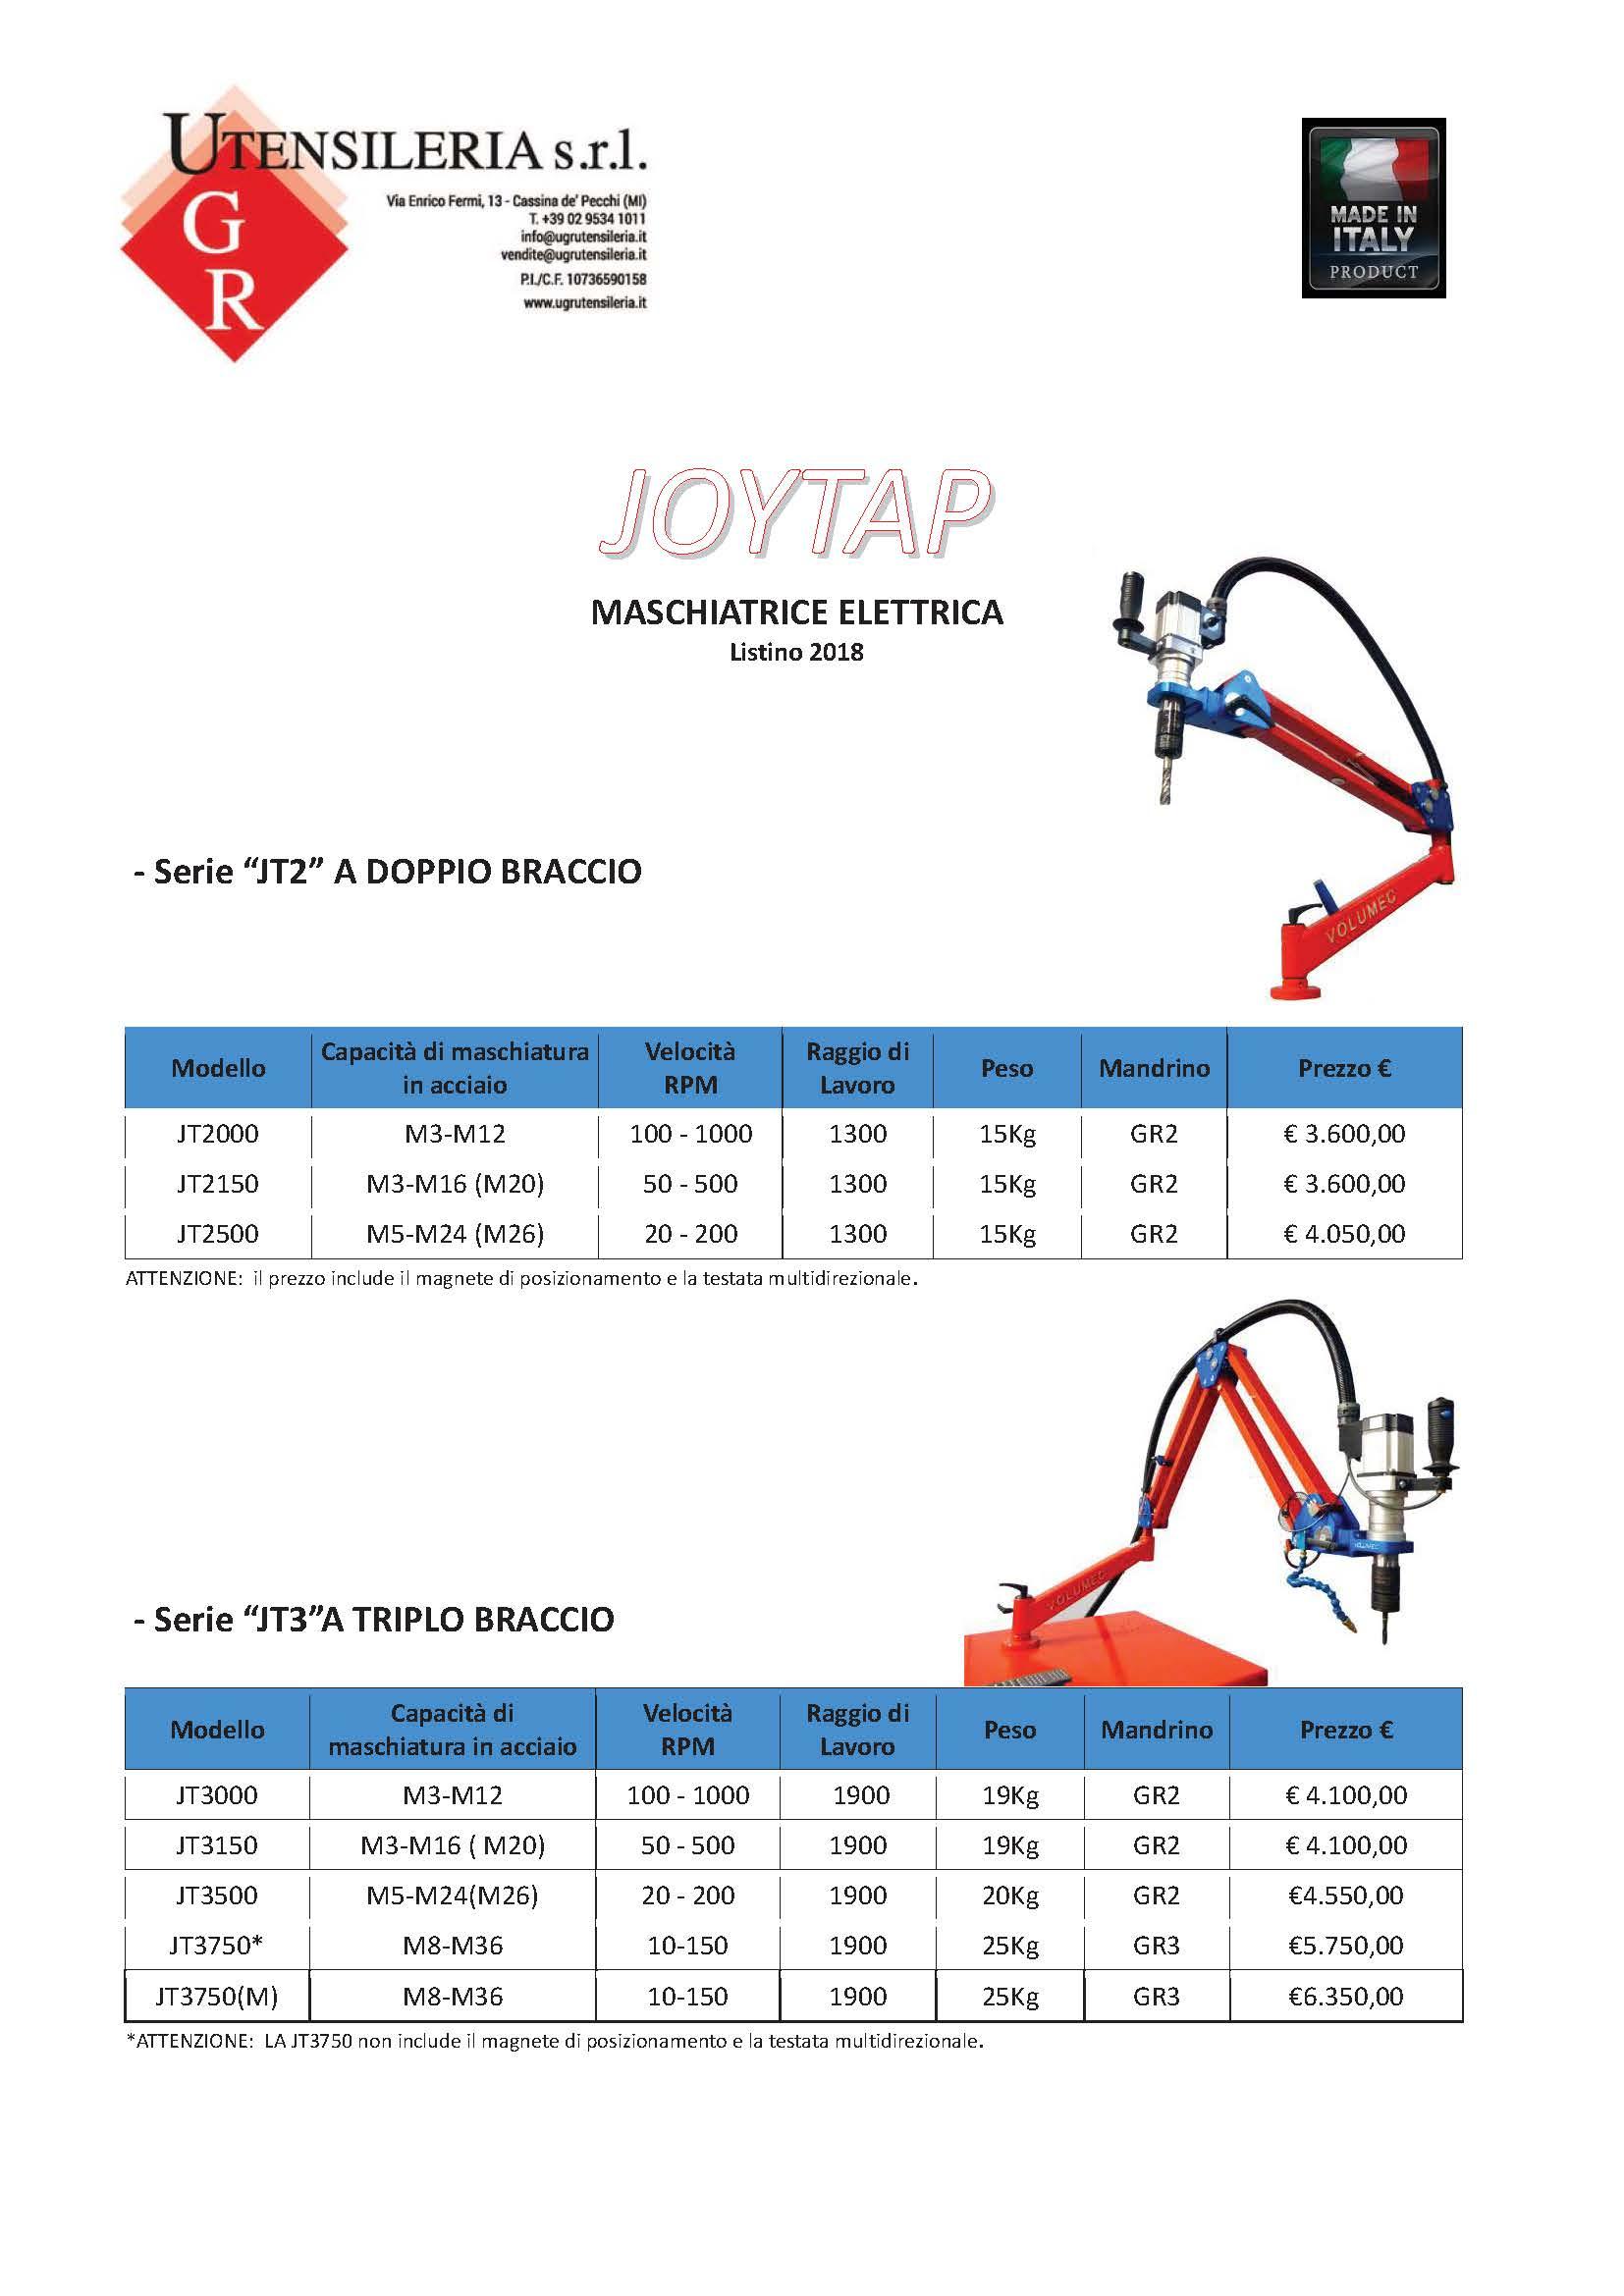 maschiatrice elettrica Joytap